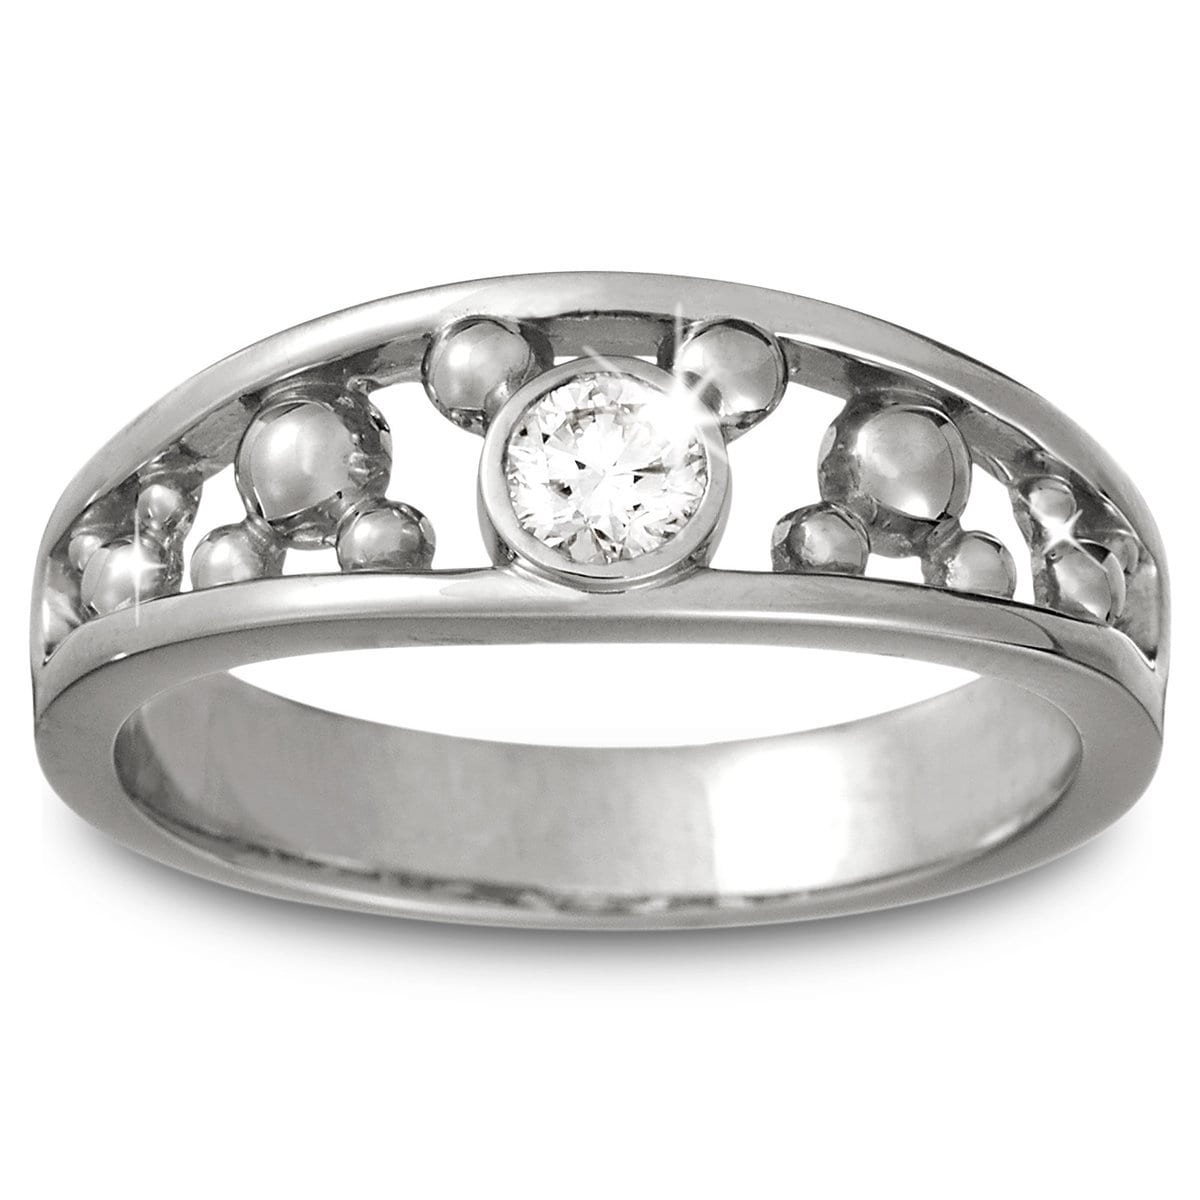 Mickey Mouse Diamond Ring for Men - Platinum | shopDisney